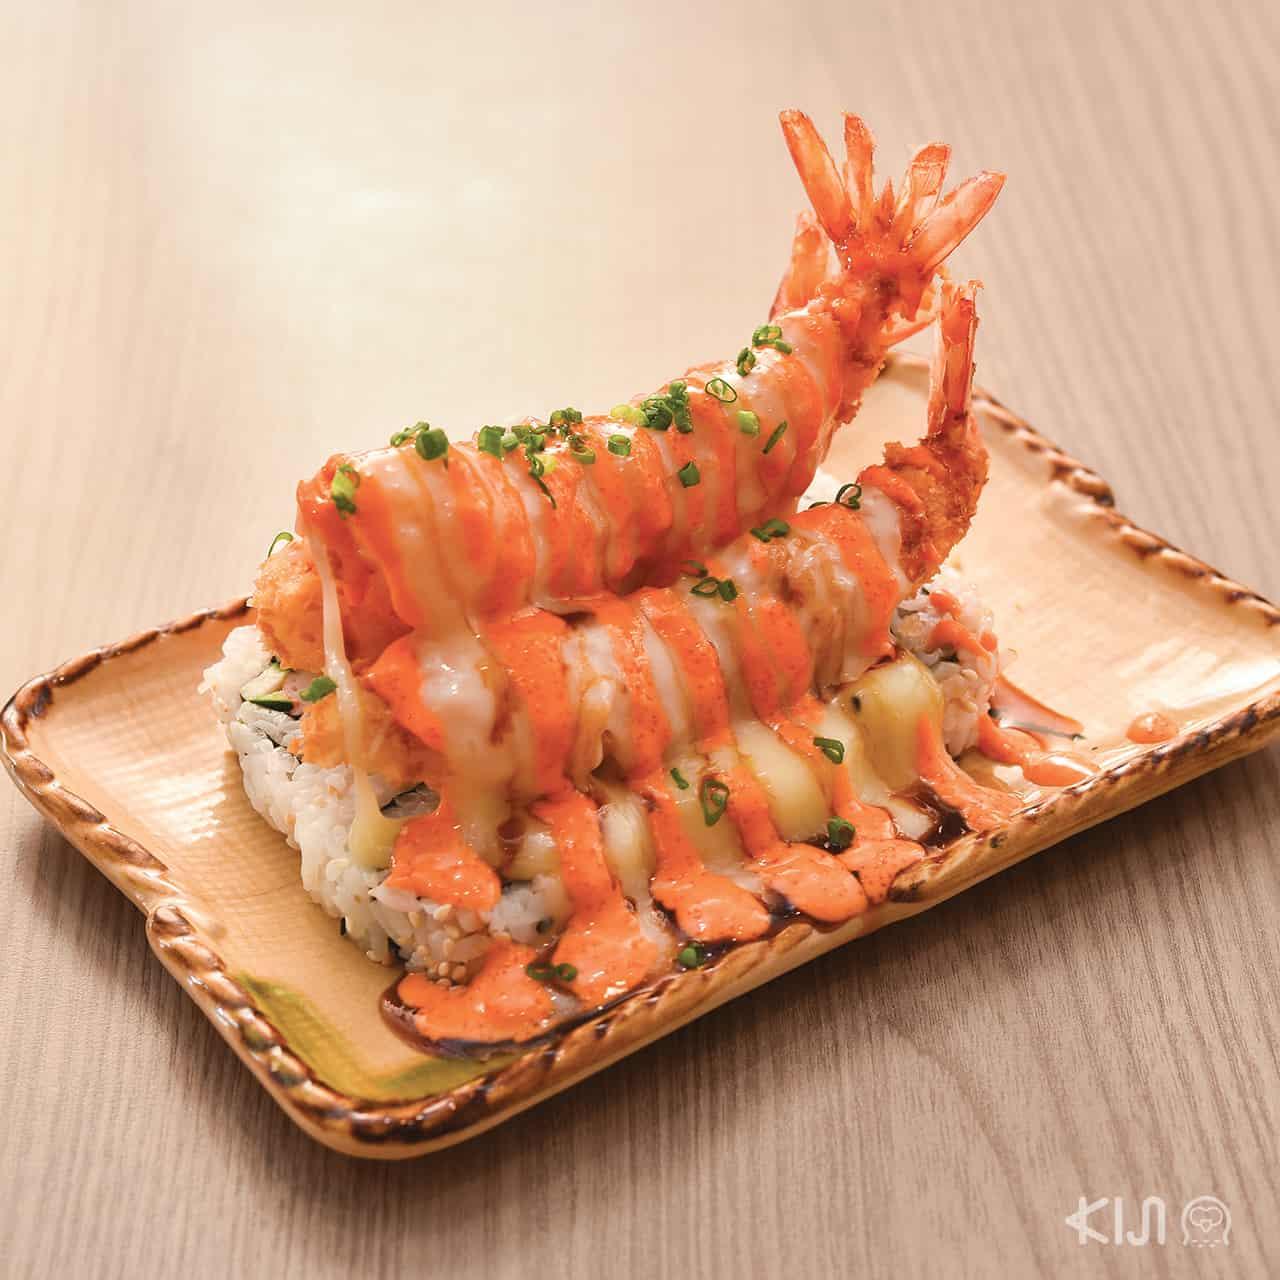 Blue Ocean Sushi